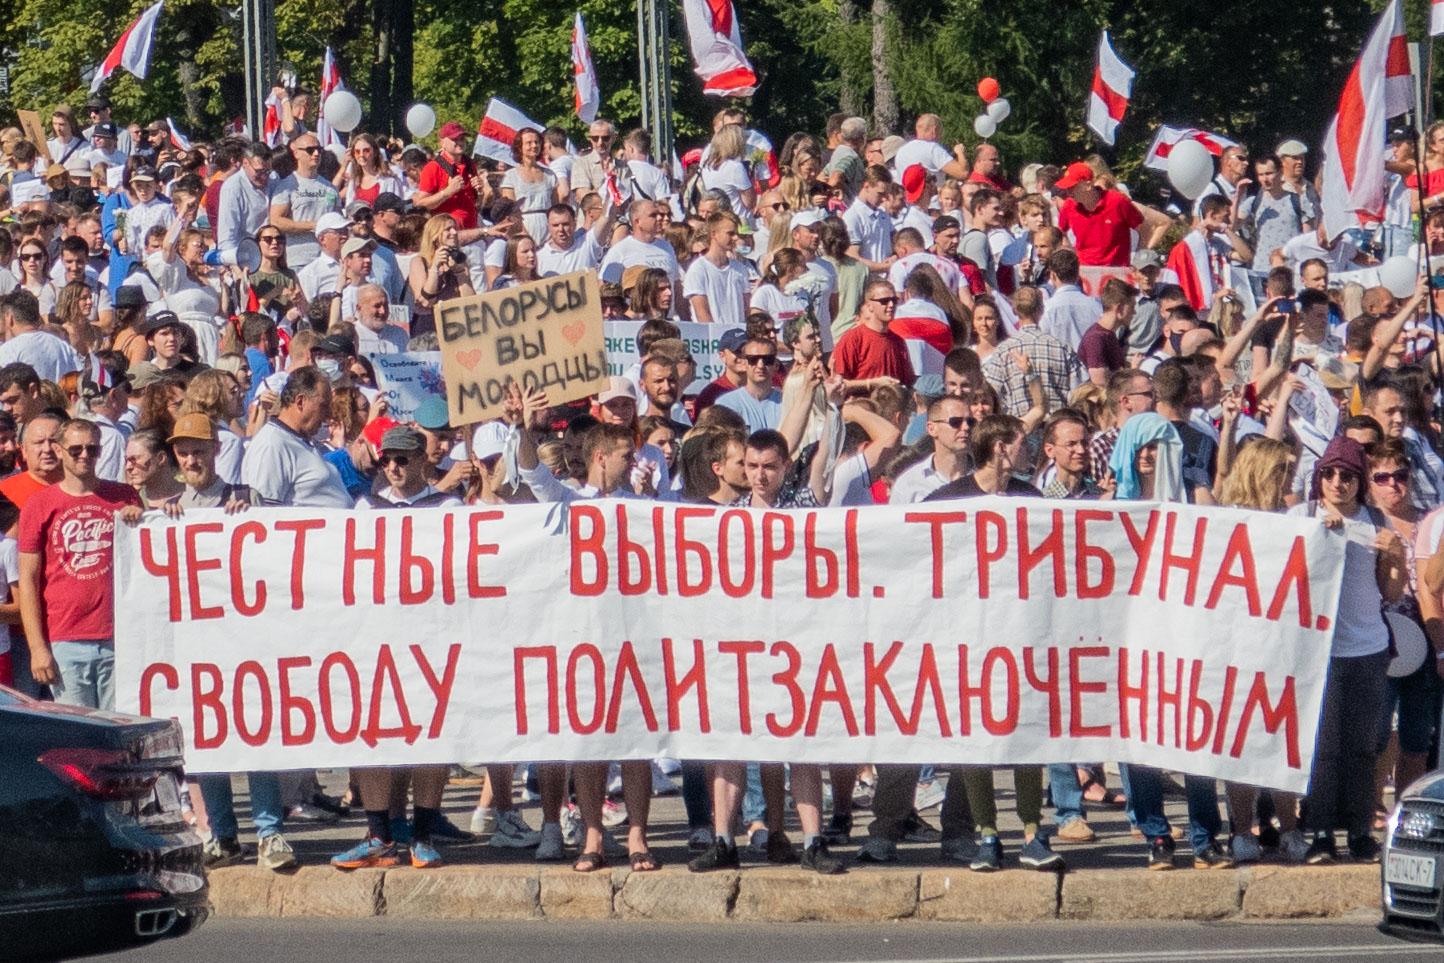 2020 Protests in Belarus